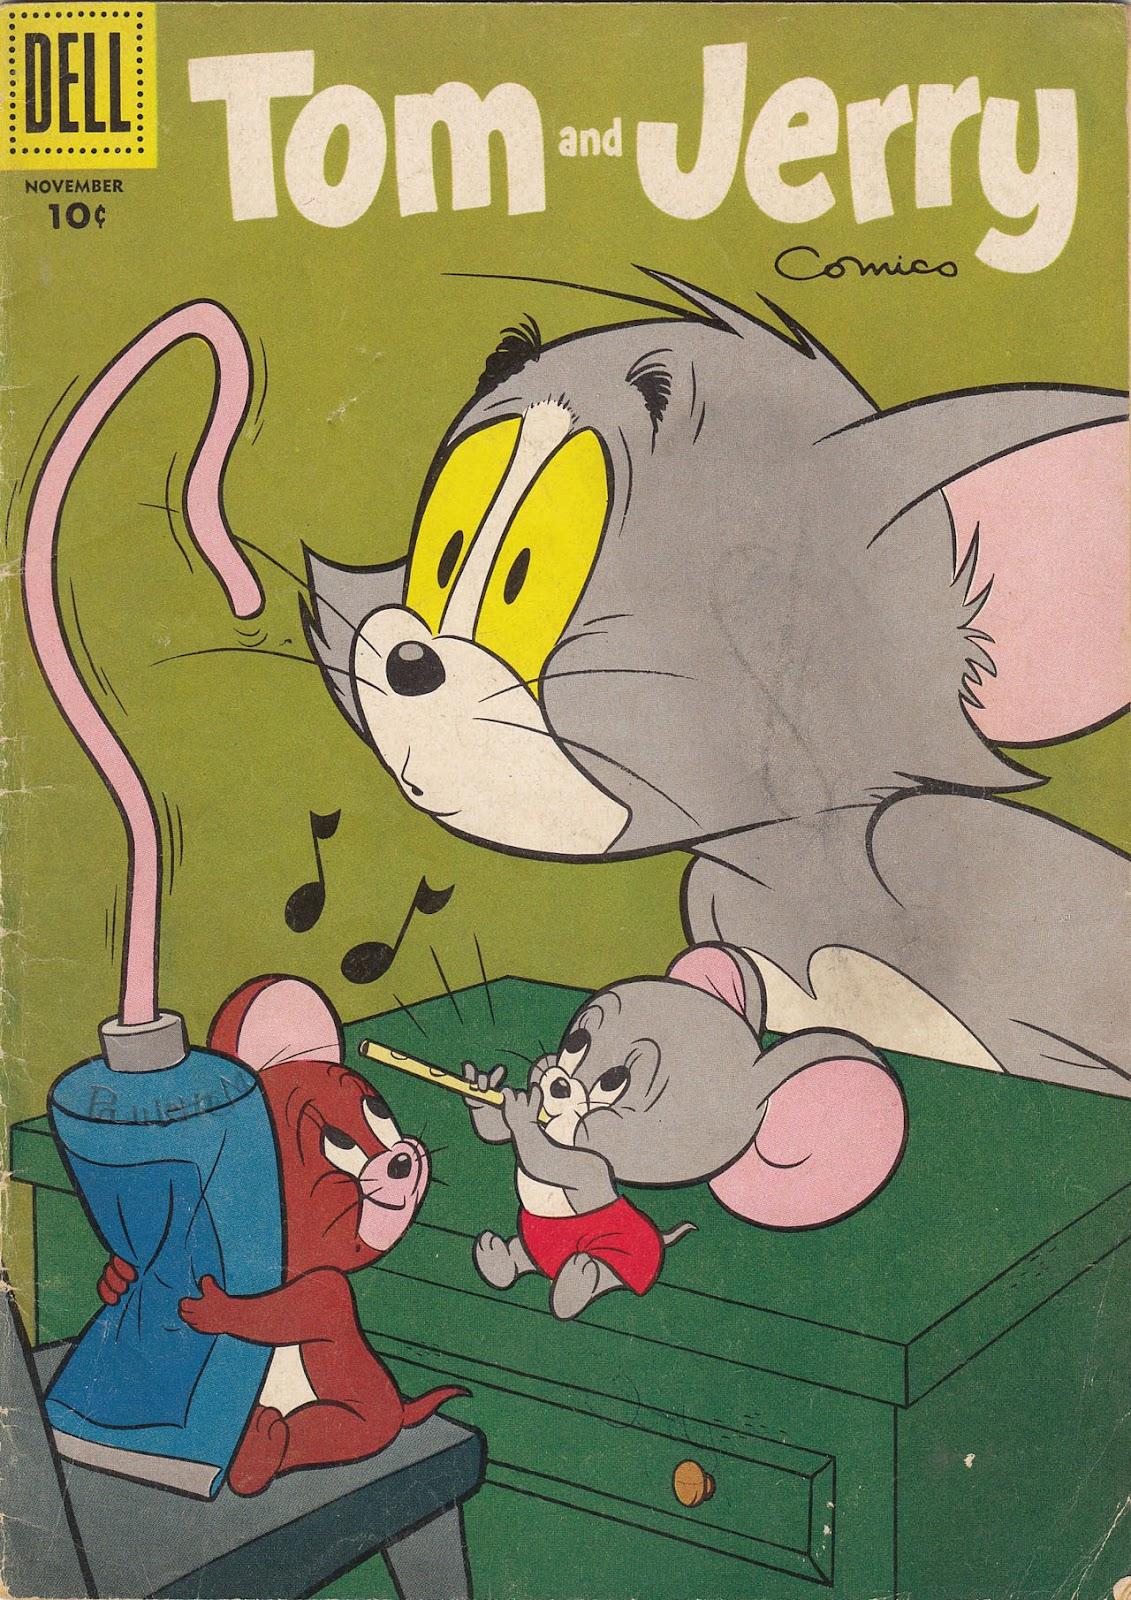 Tom & Jerry Comics 148 Page 1